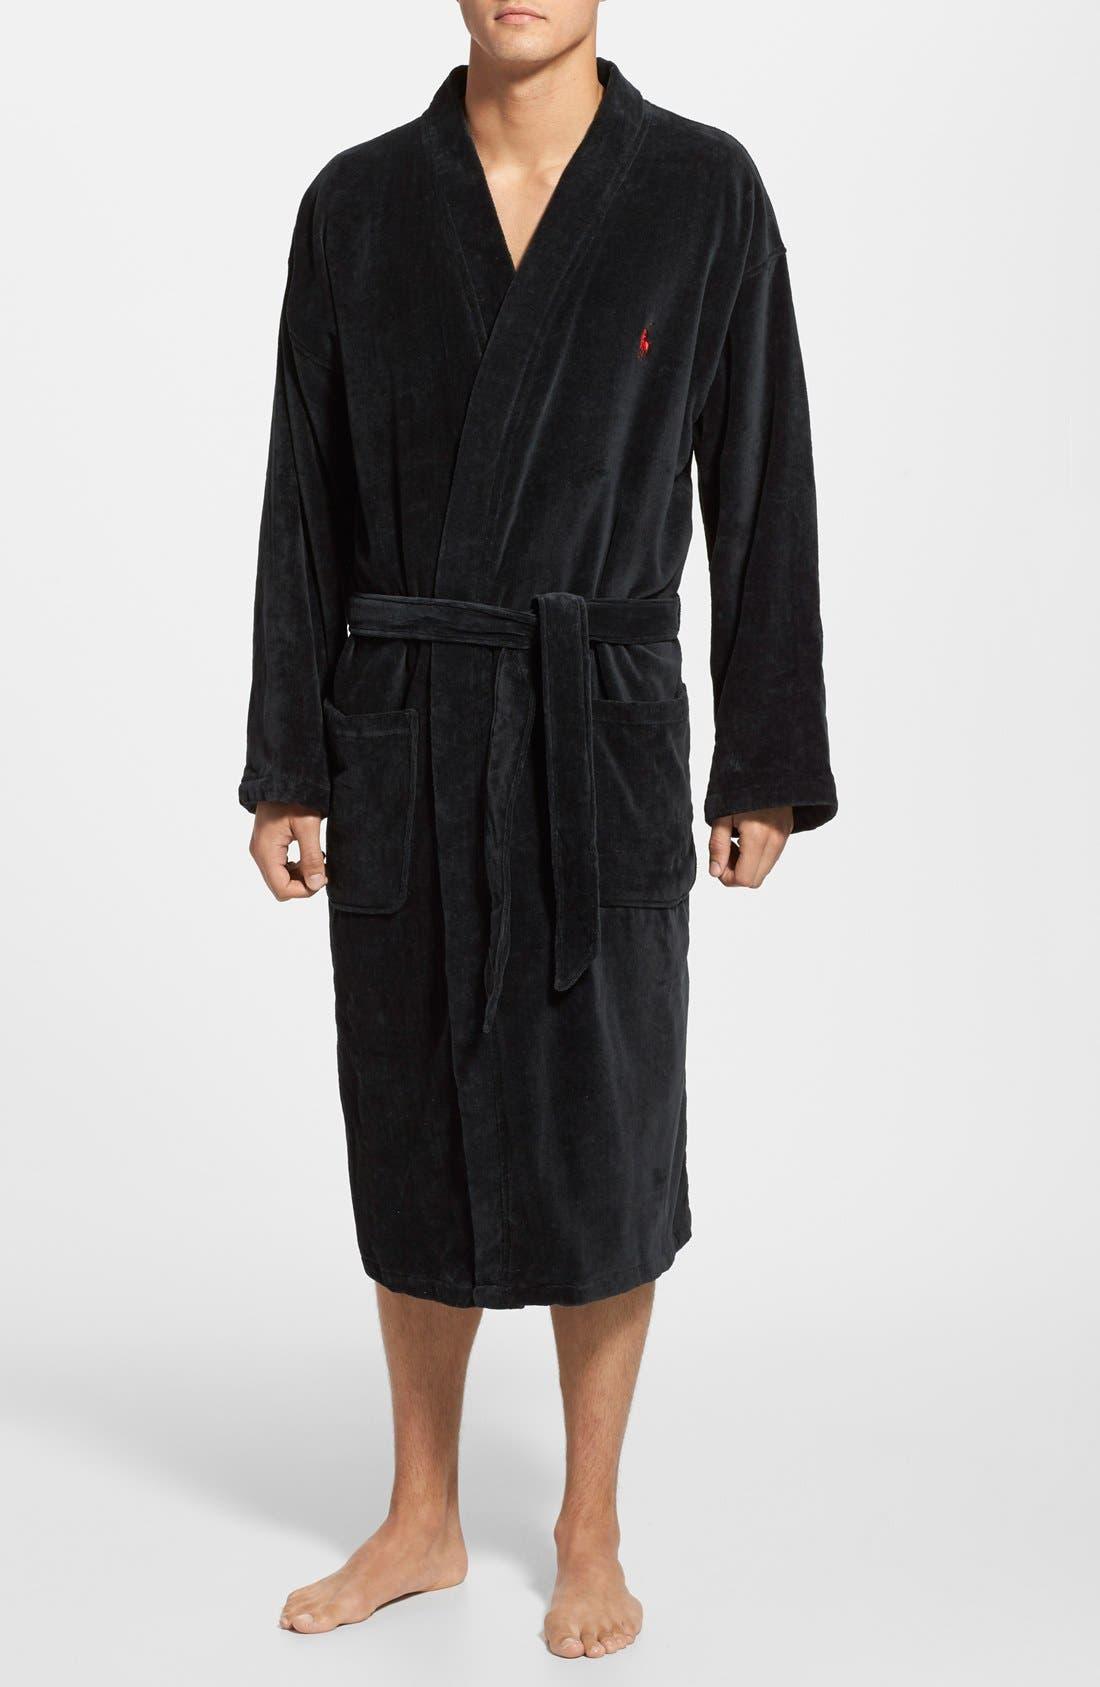 POLO RALPH LAUREN Velour Kimono Robe